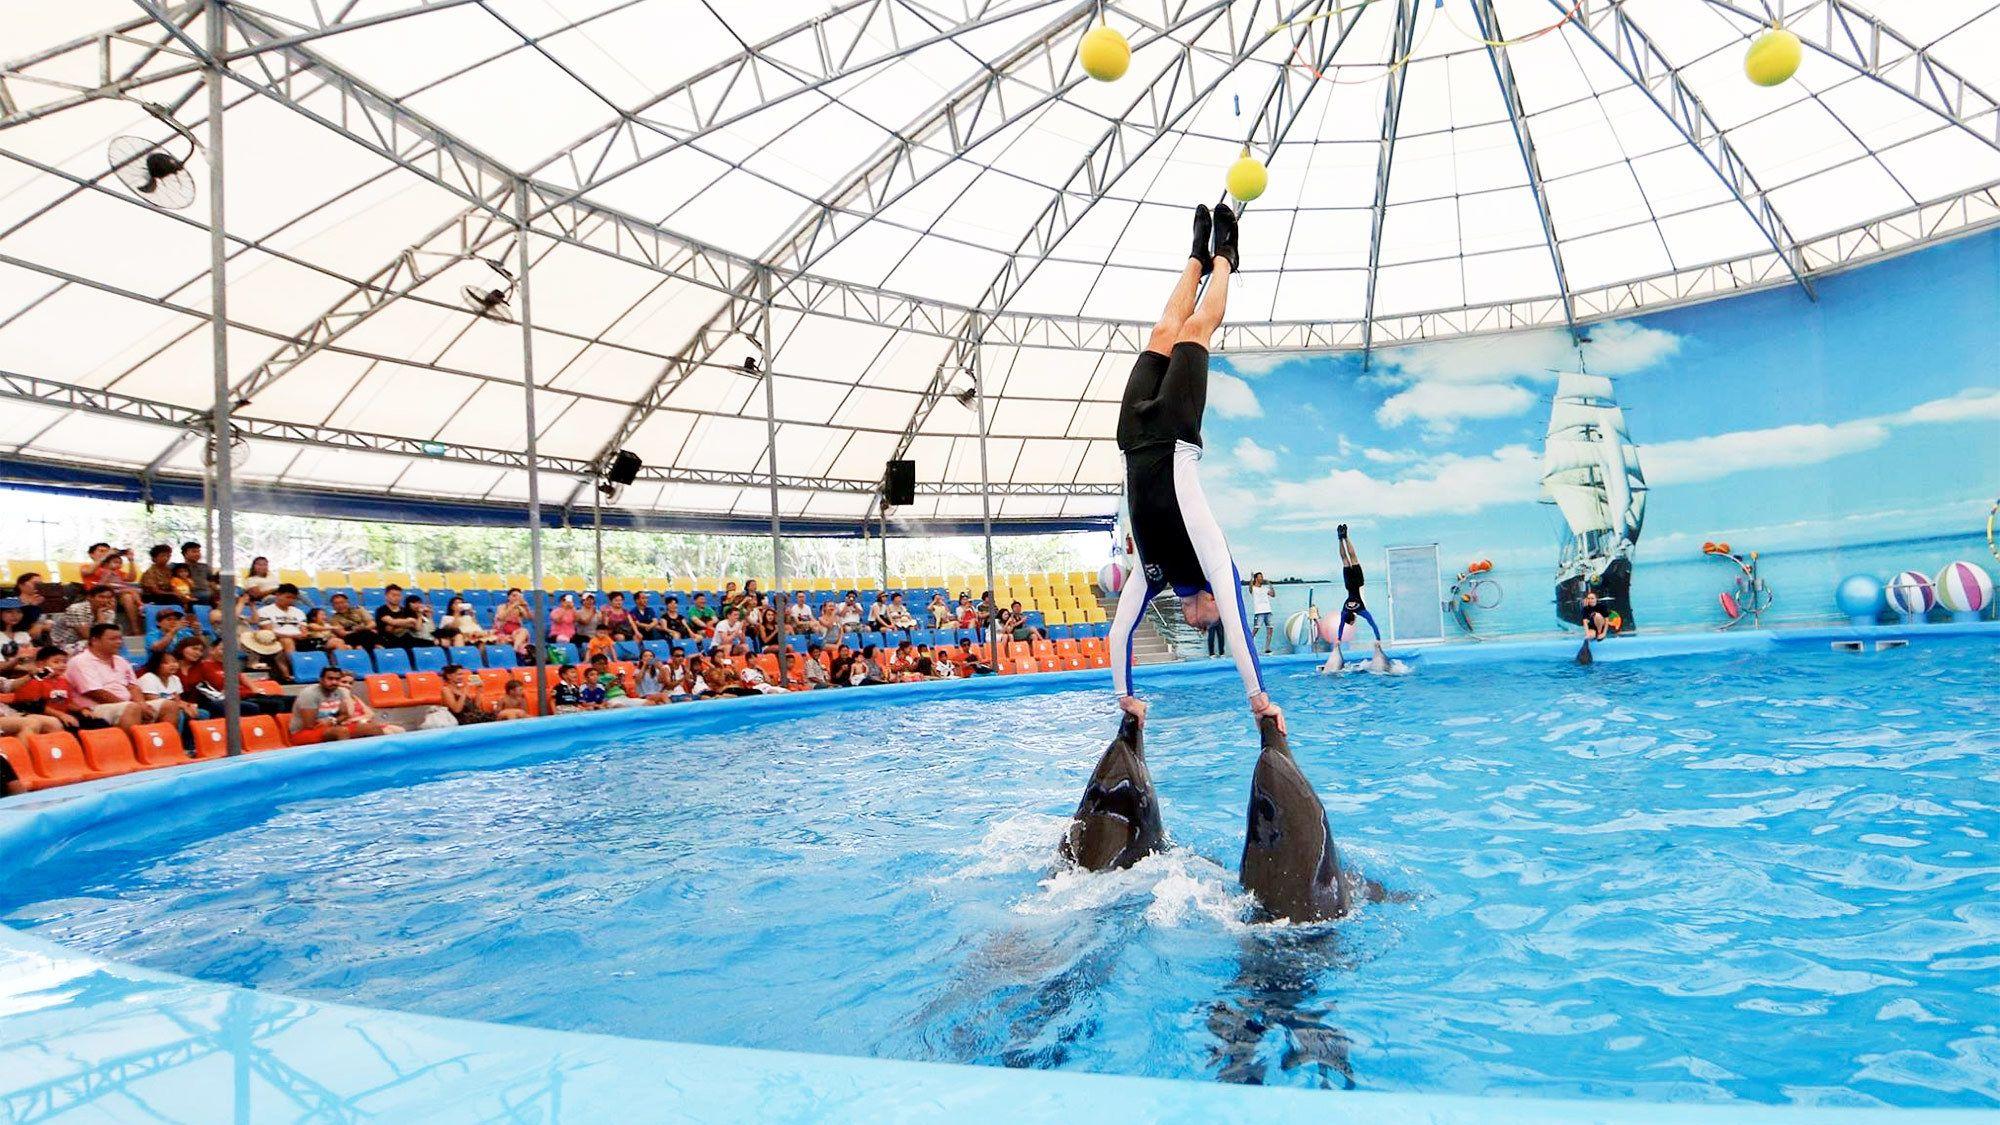 Dolphin Show in Phuket